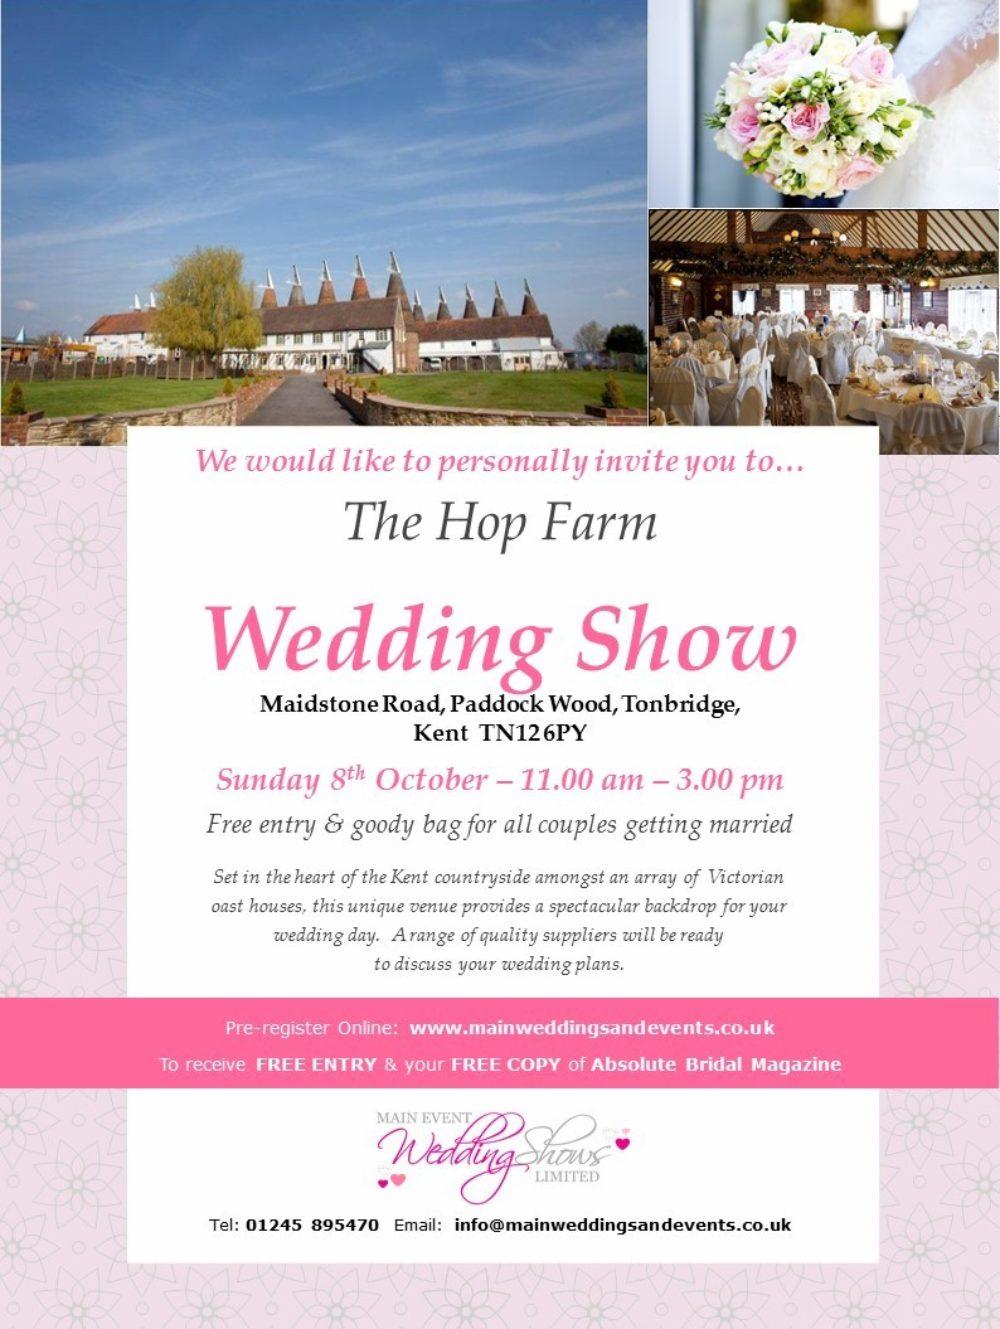 Wedding Show Invite 08 10 17